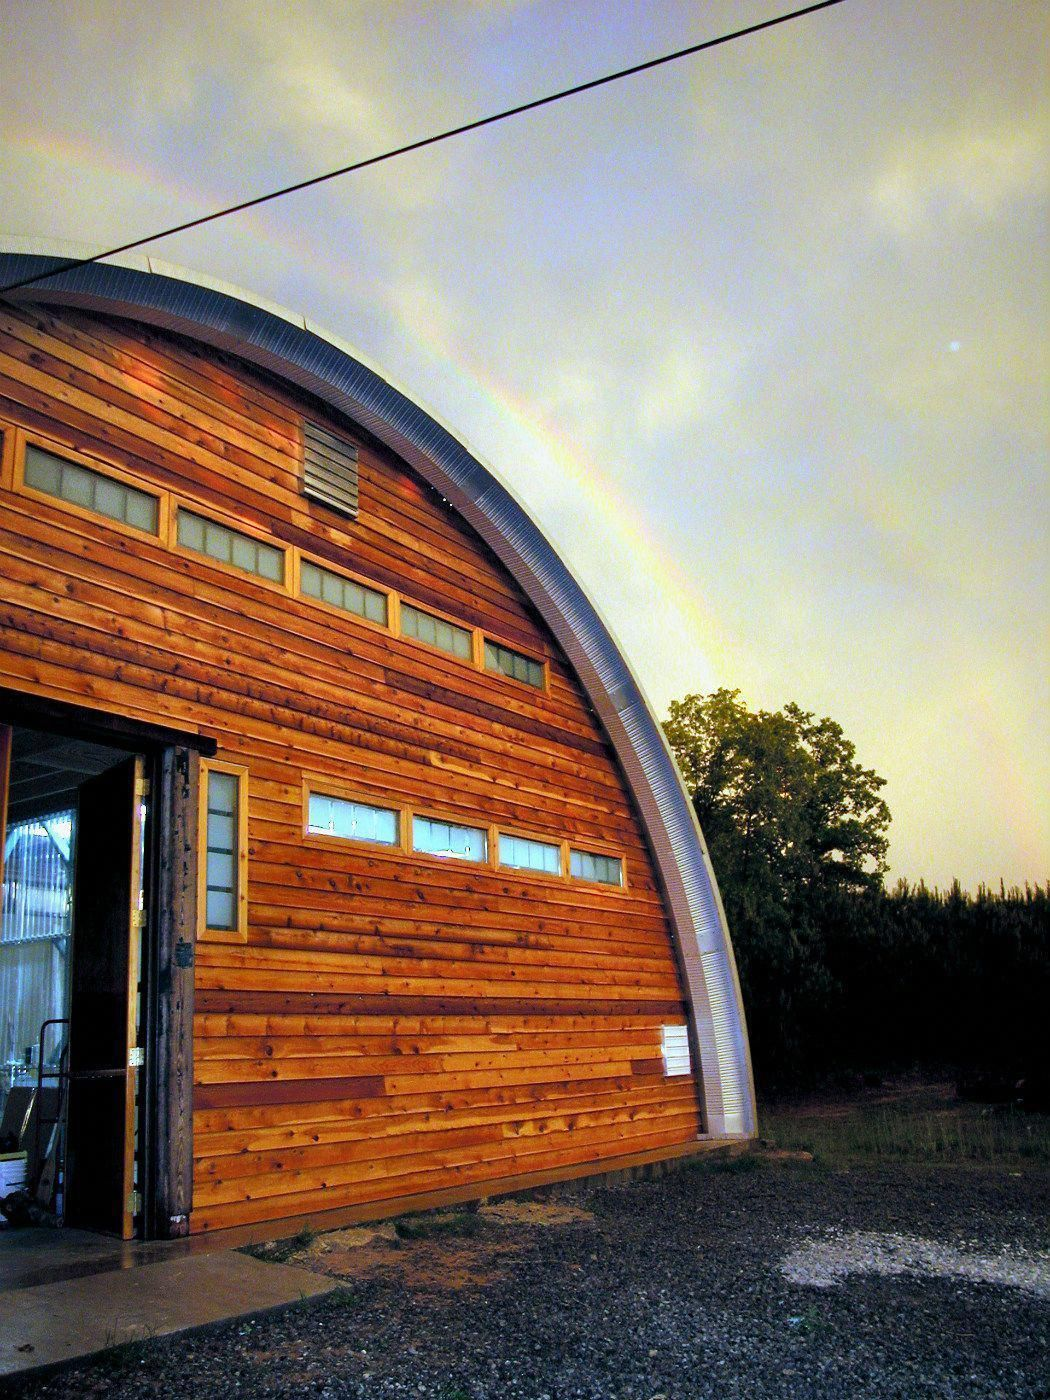 40 unique quonset hut homes ideas quonsethuthomes kit